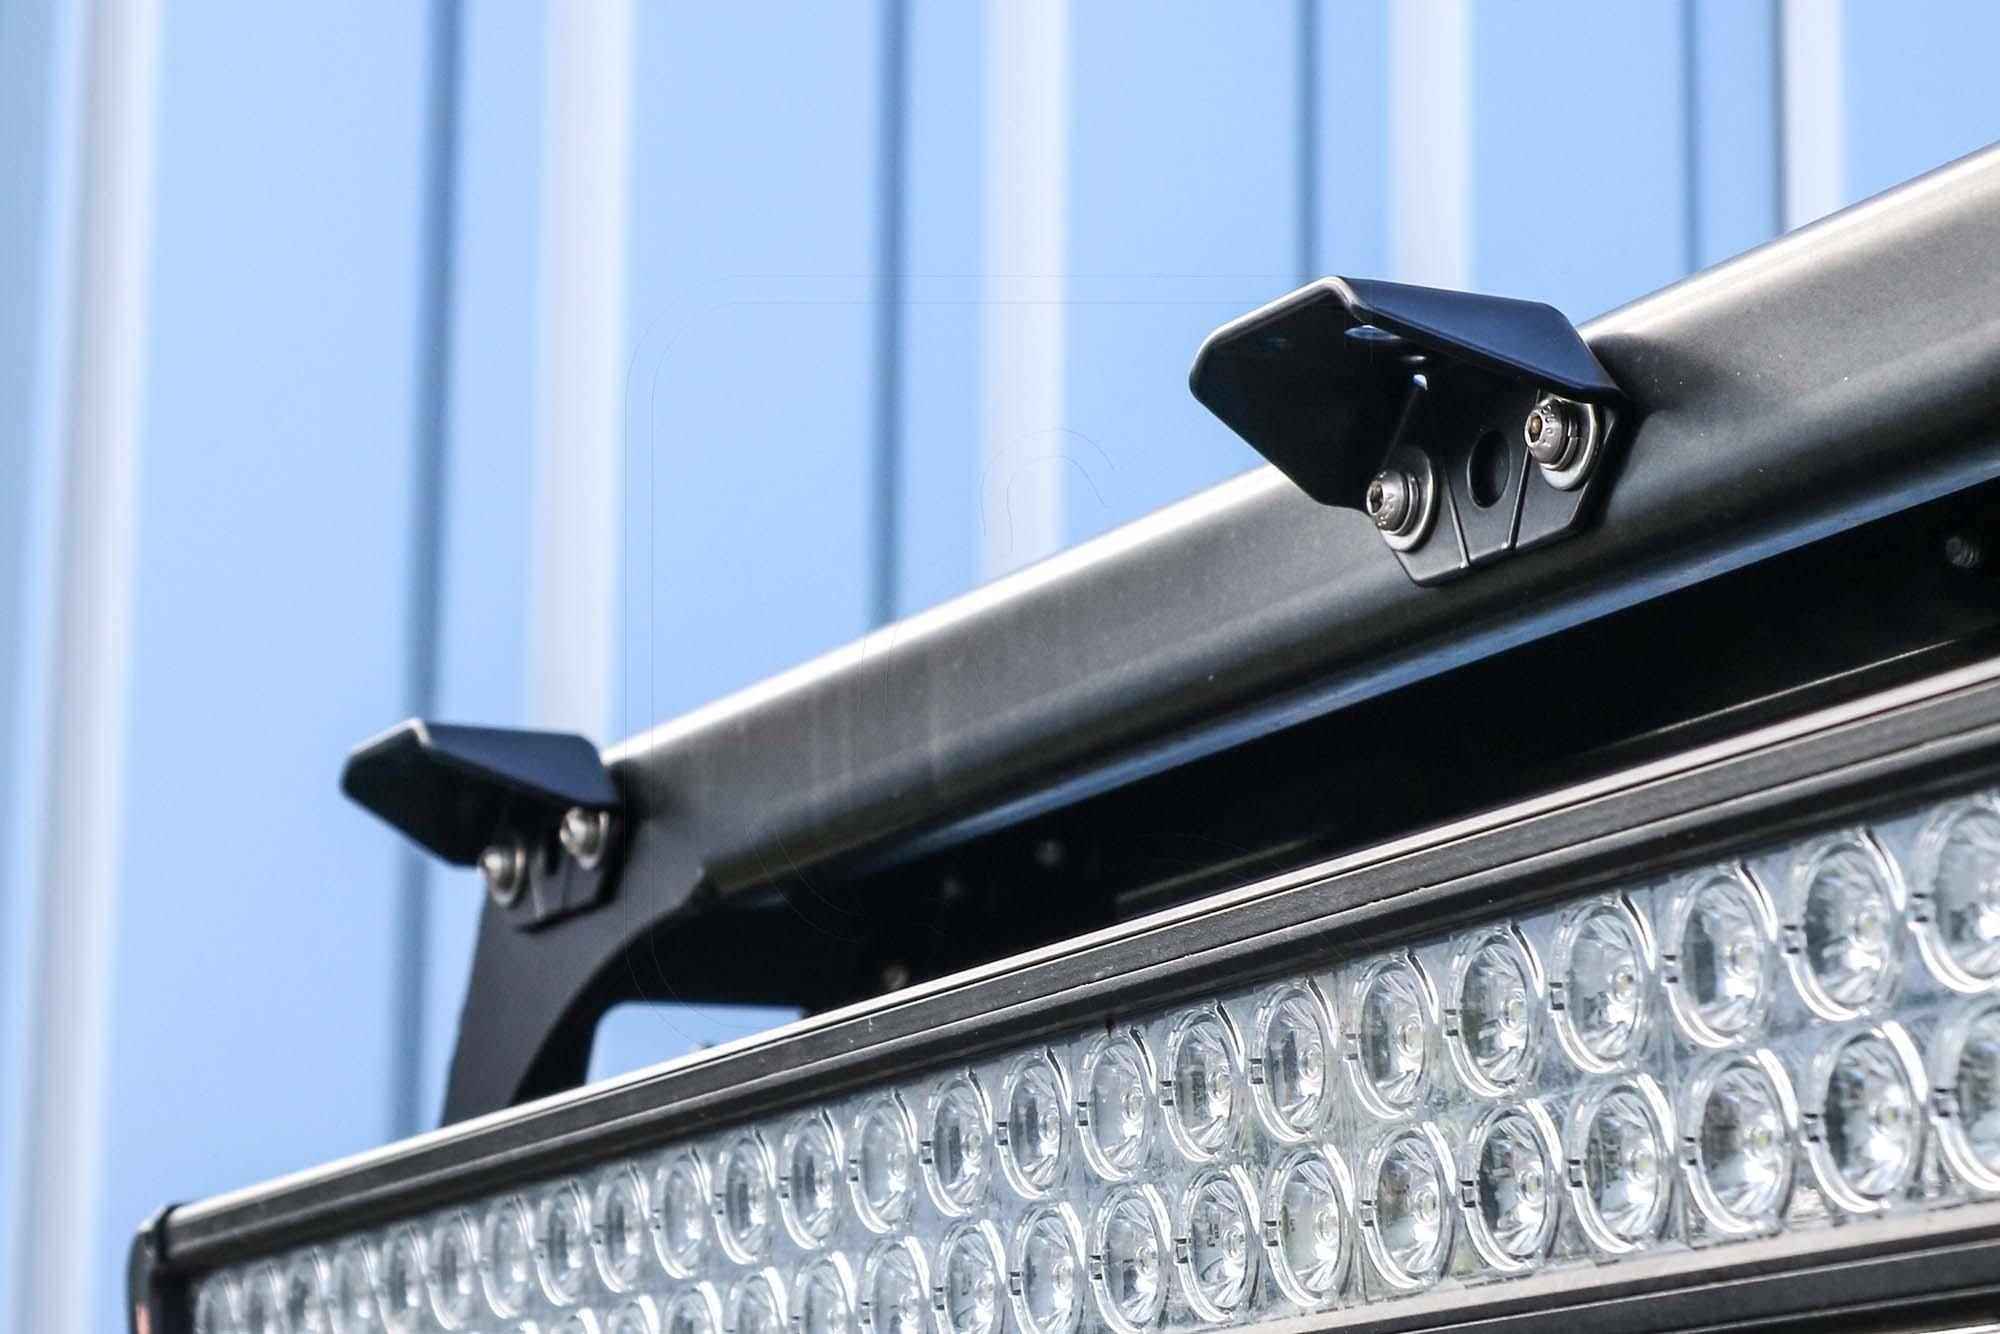 CargoBear Bracket for 'Connector Bar' or smaller worklights (EACH BRACKET SOLD INDIVIDUALLY)